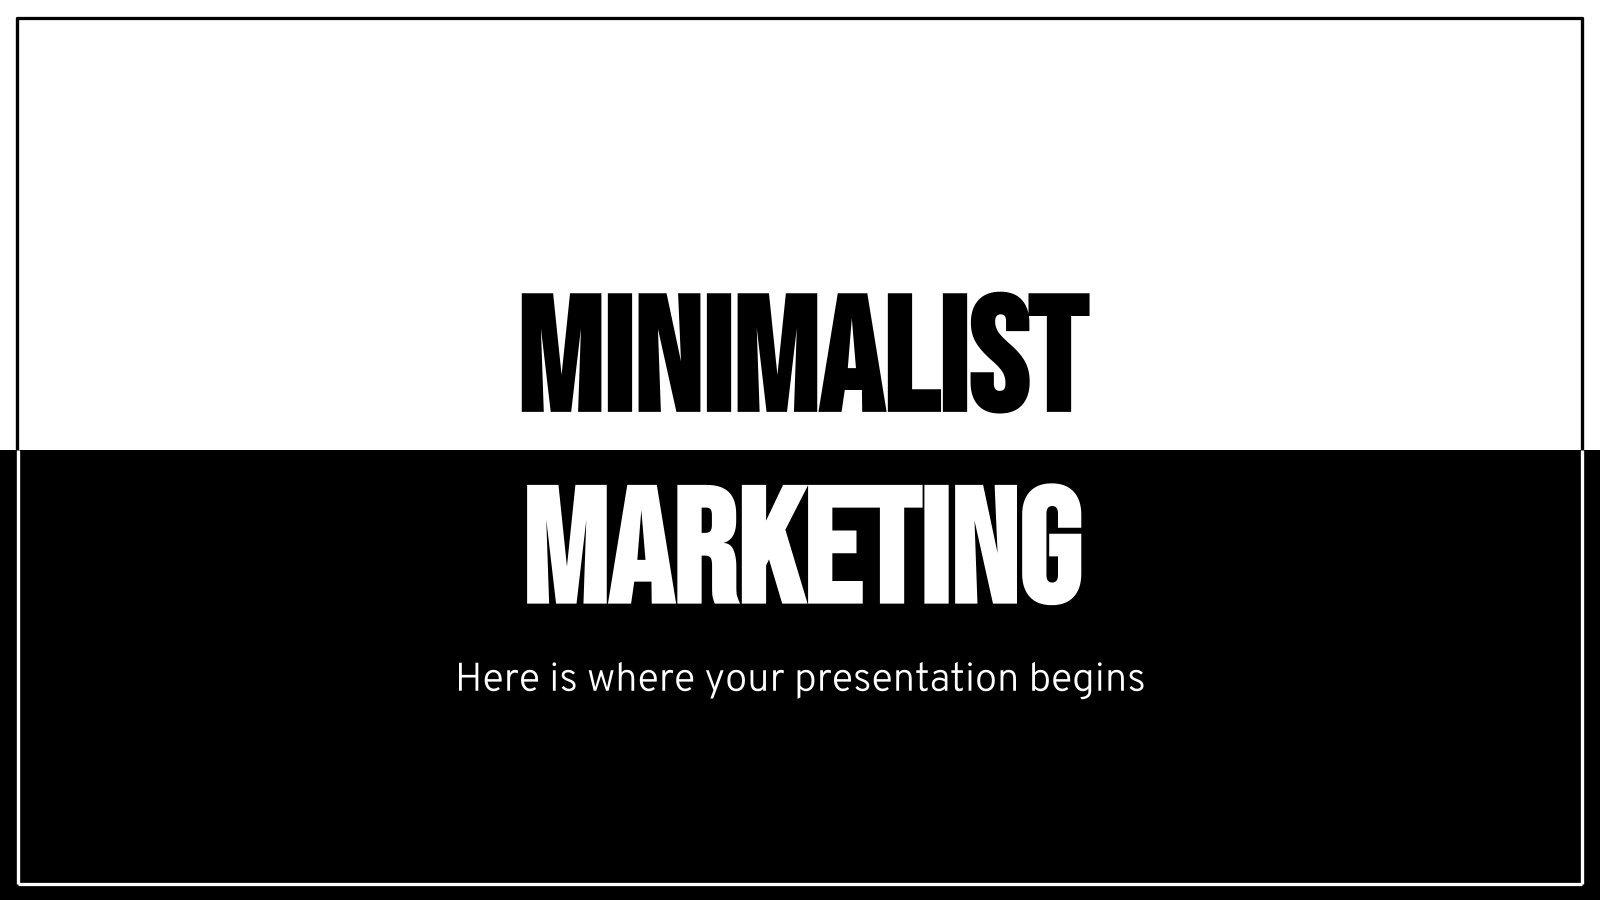 Minimalist Marketing Plan presentation template